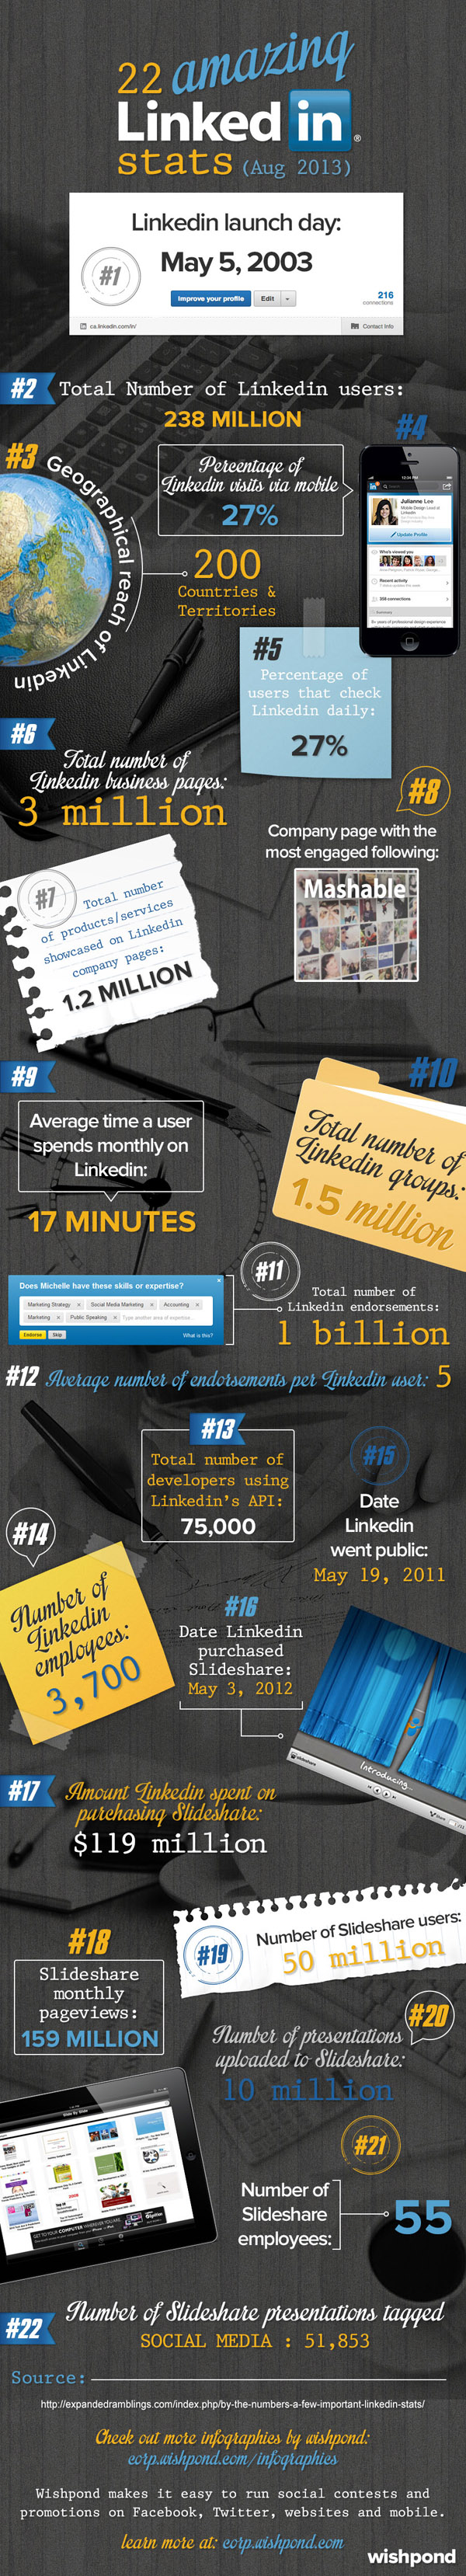 Linkedin Stats - Infographic